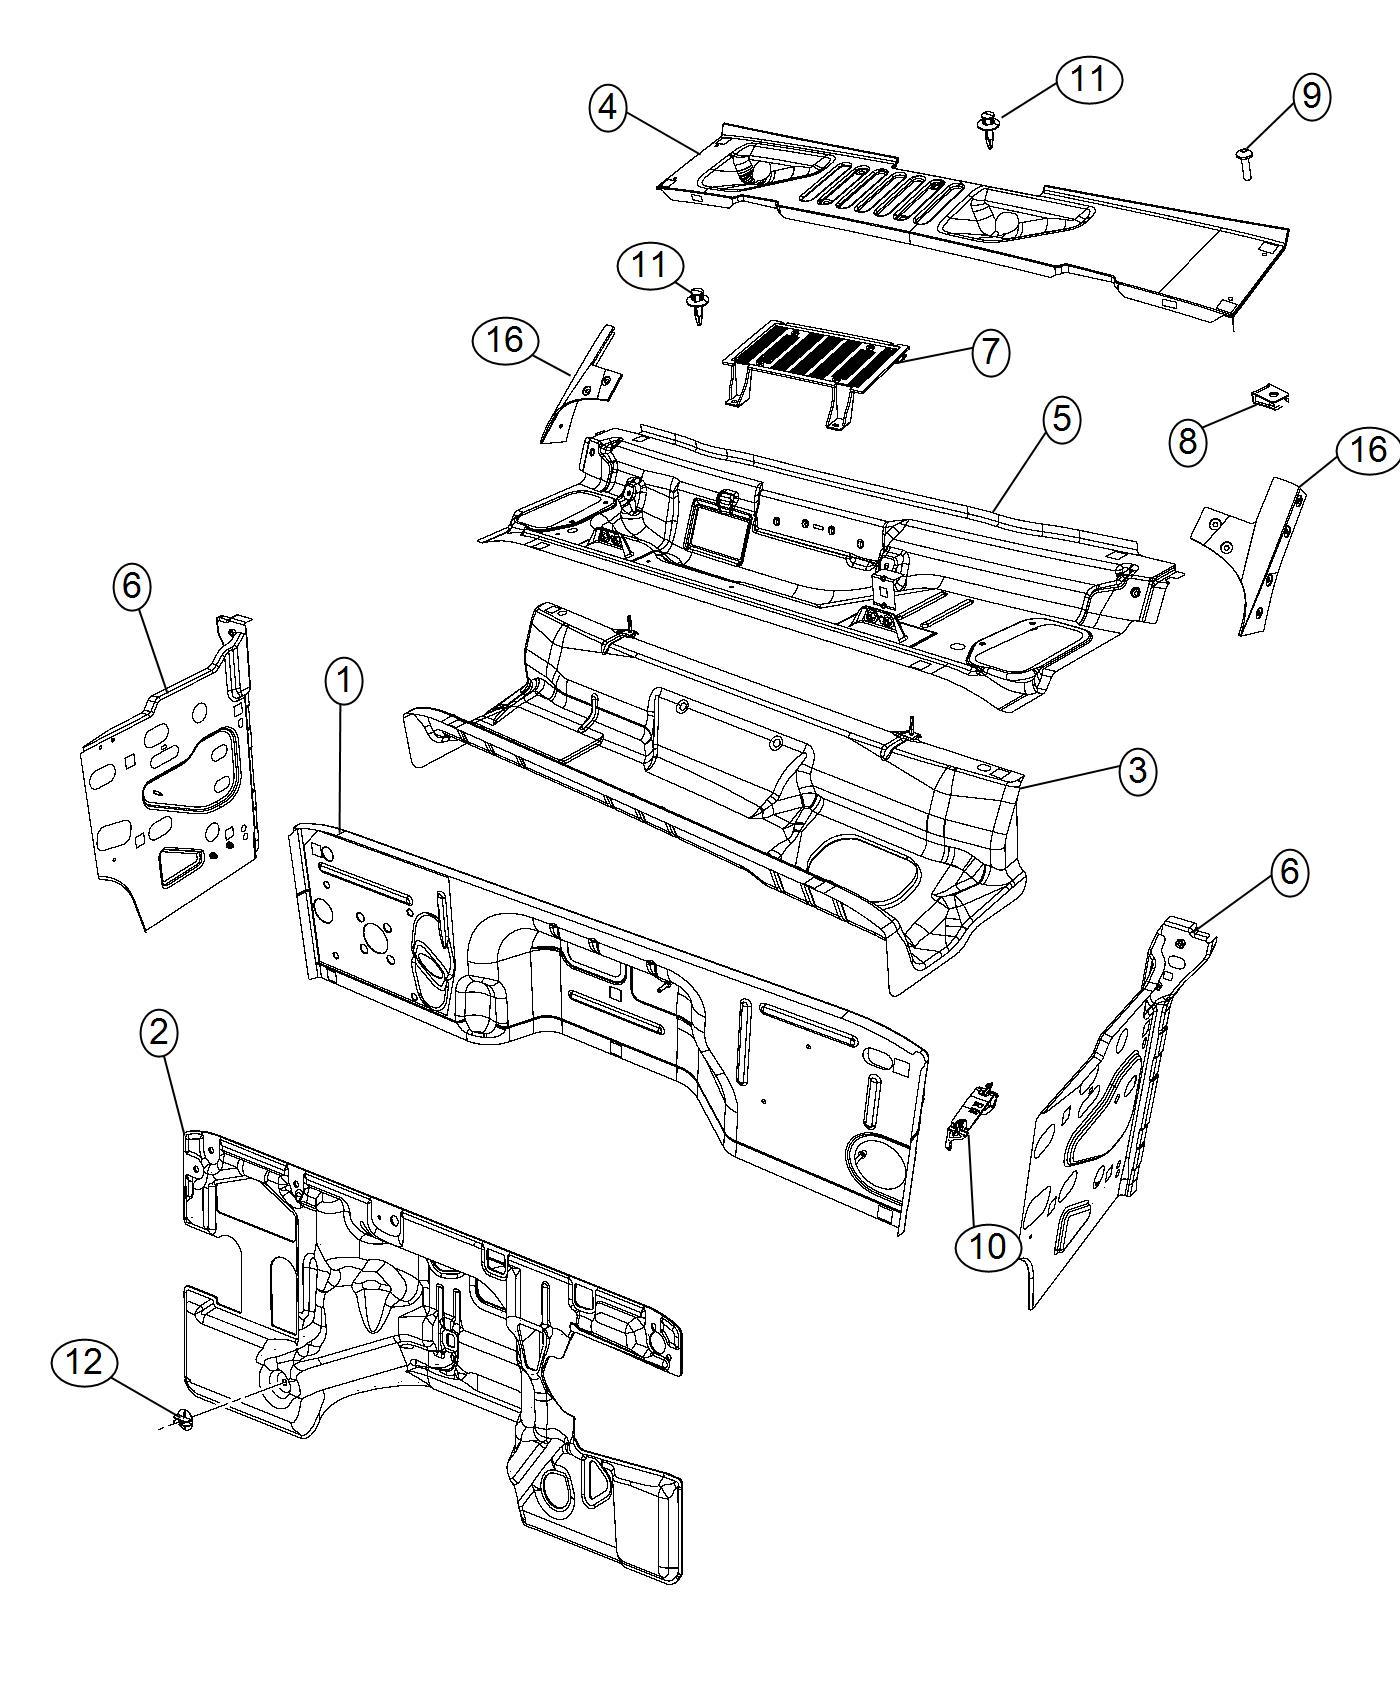 Dodge Ram Battery Relocation Kit Wiring Diagram Database